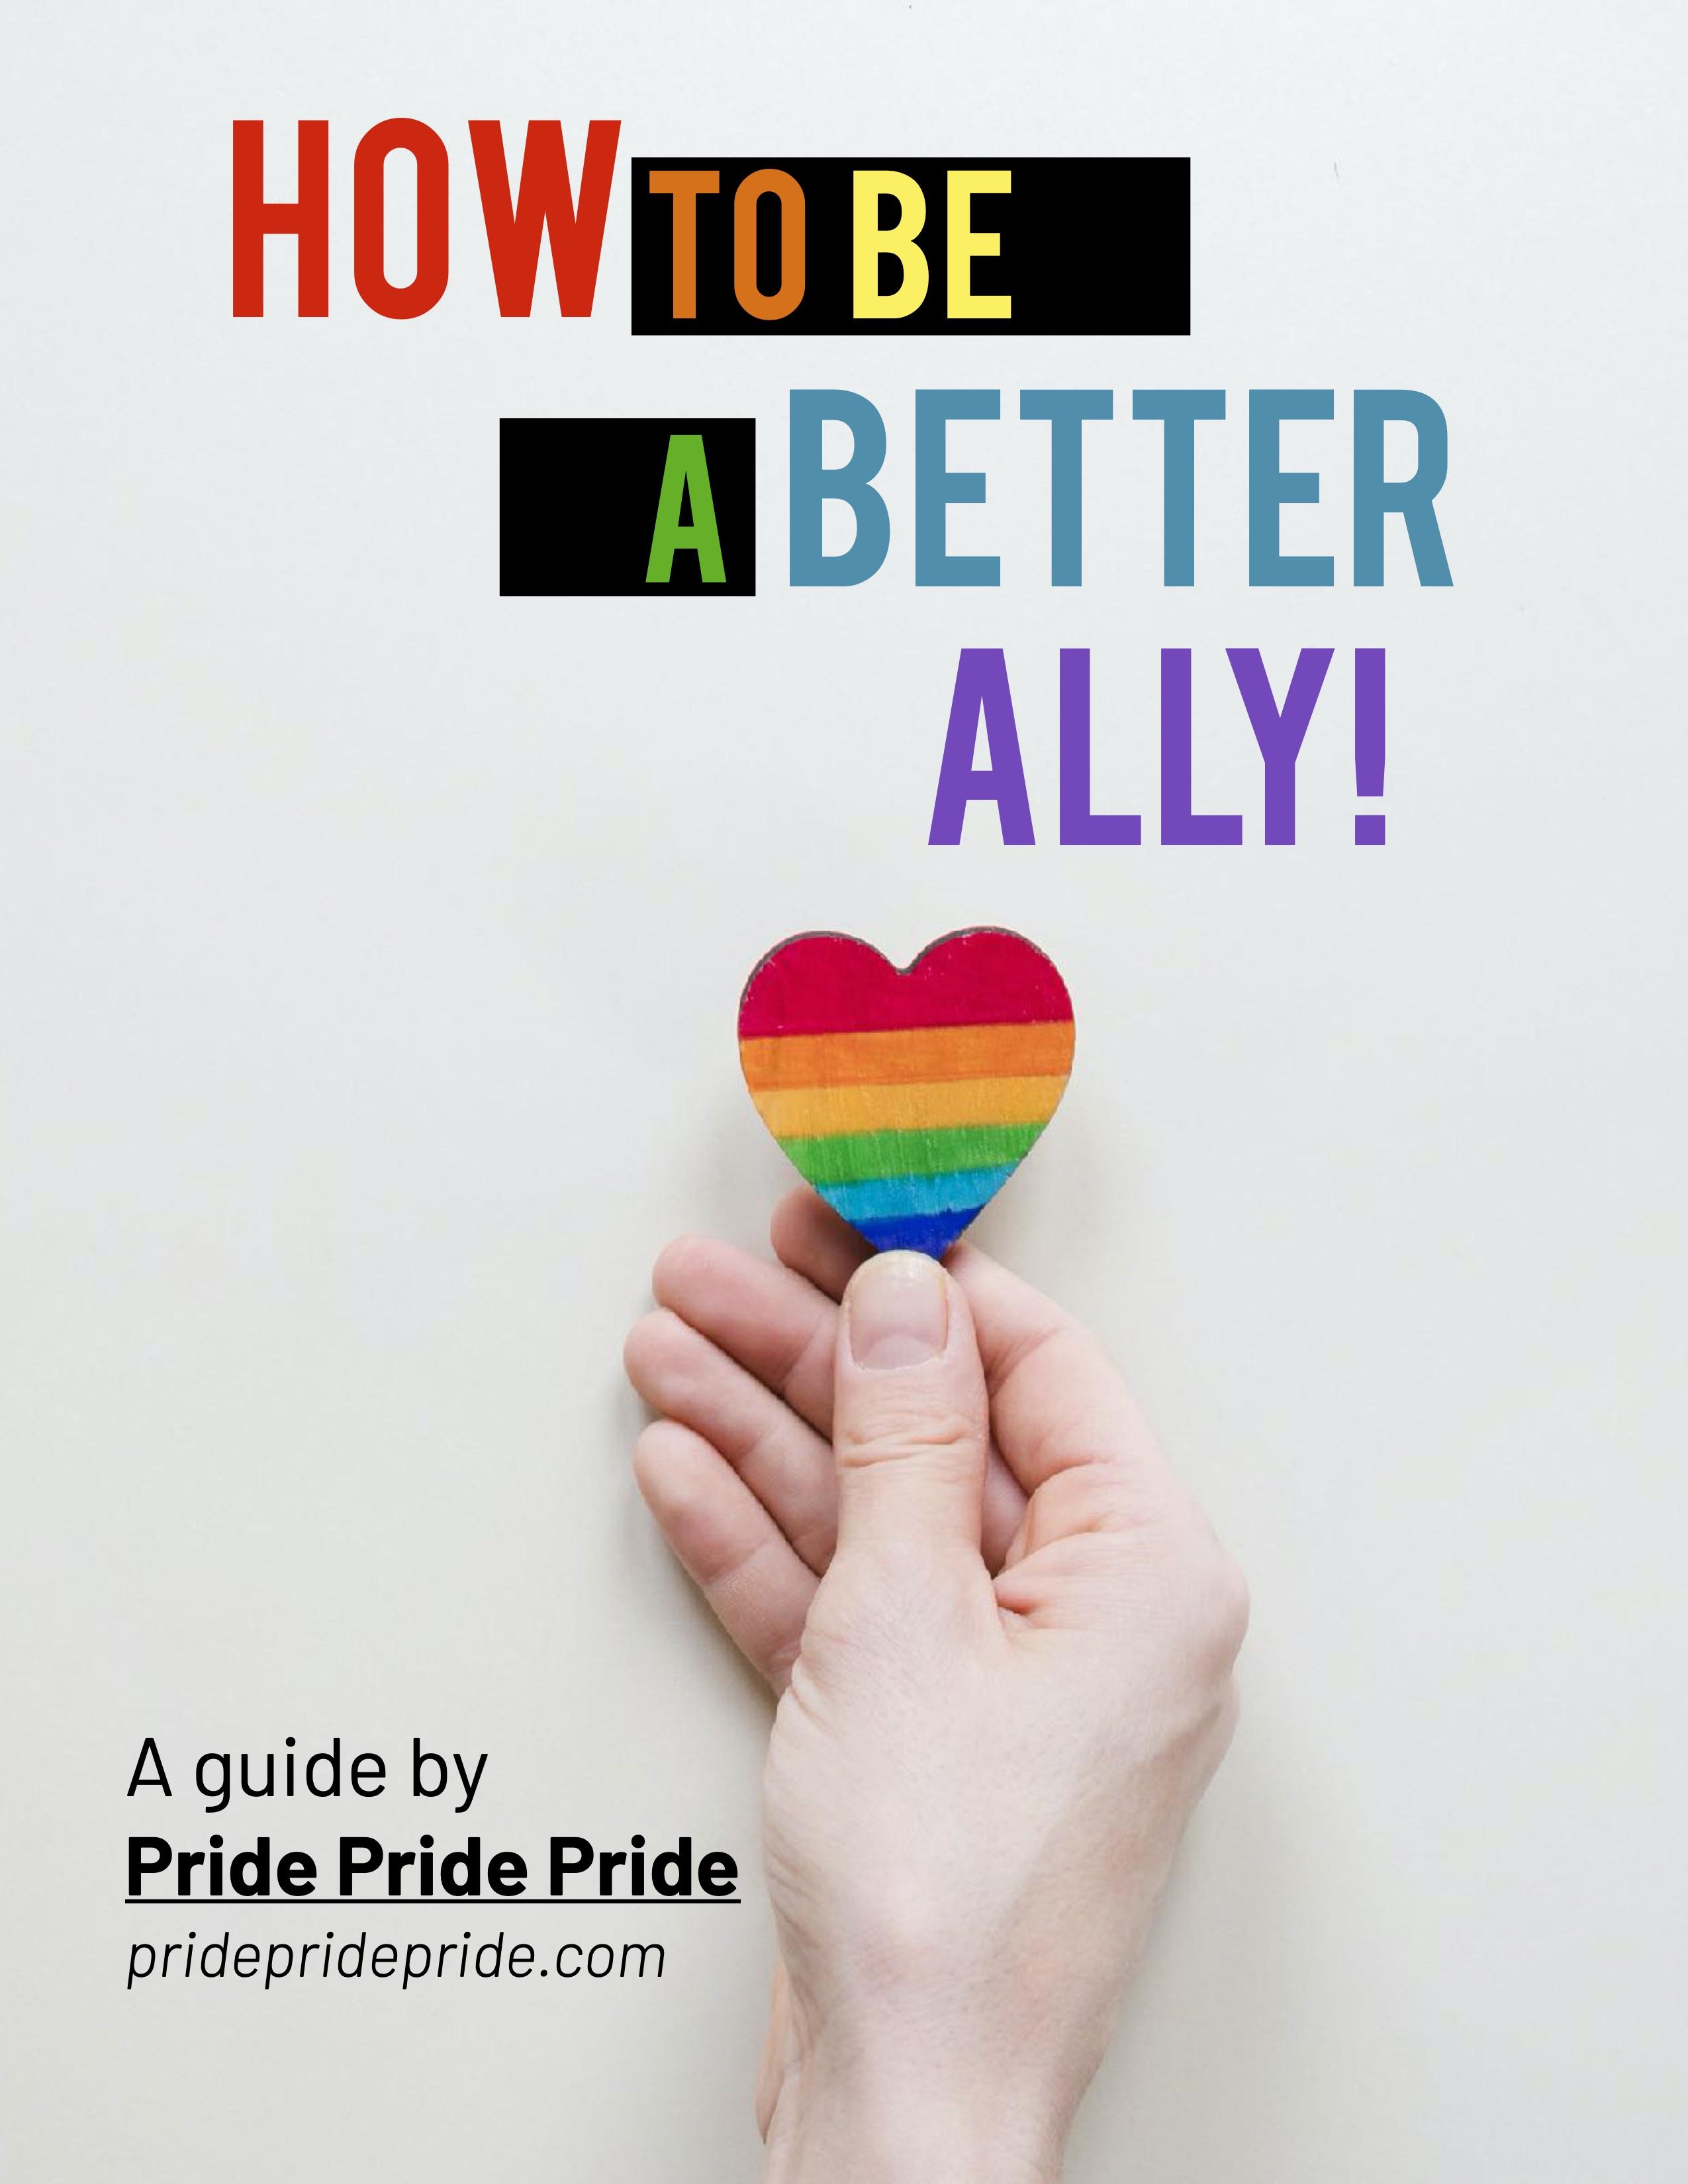 how-to-be-an-ally-pridepridepride-dot-com.jpg